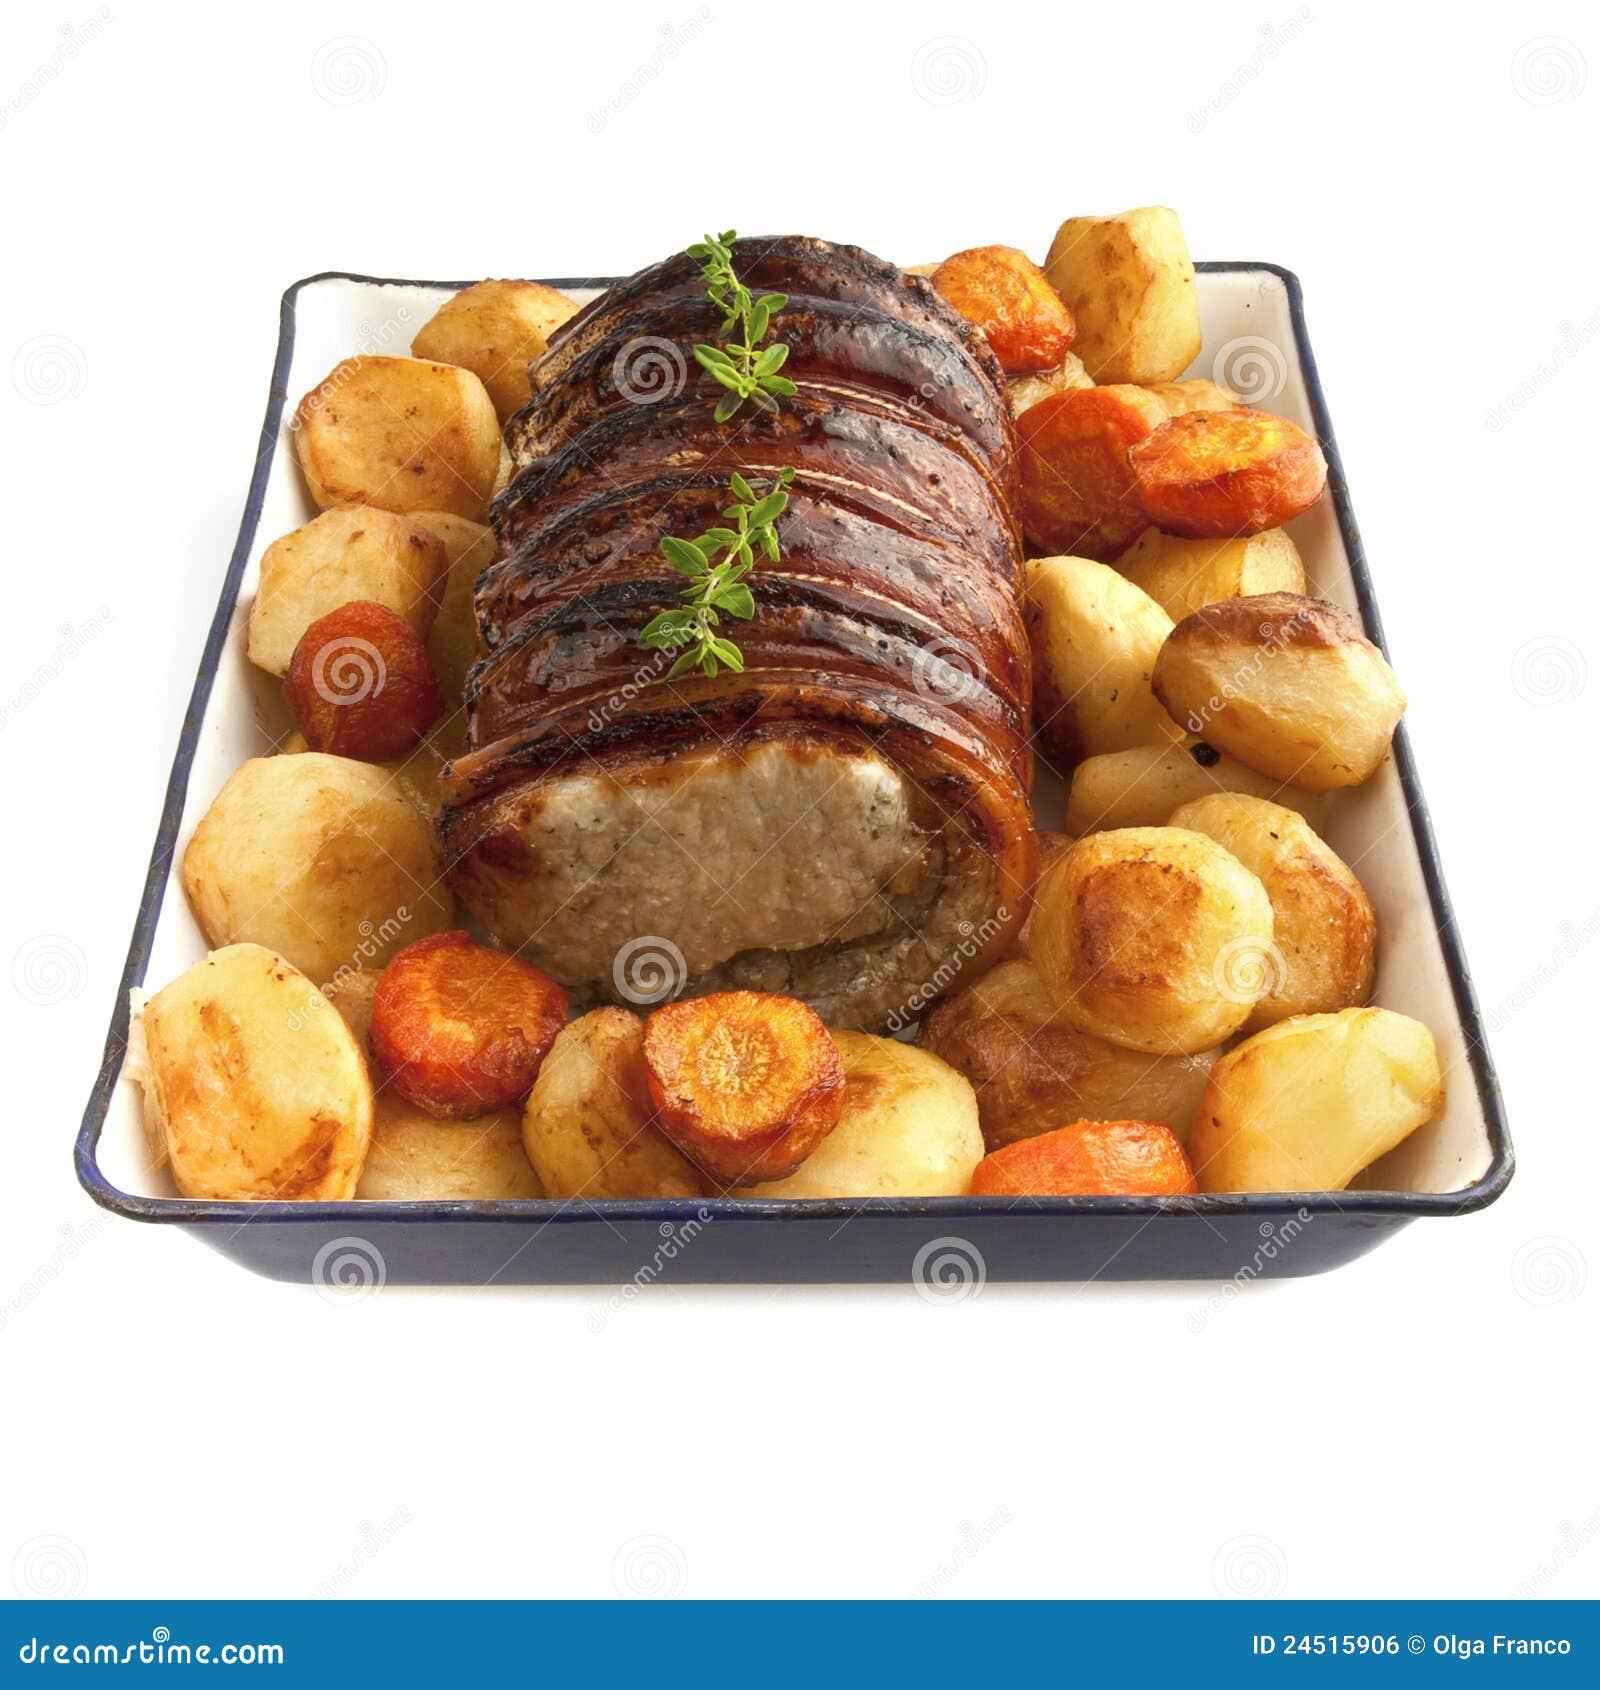 Sunday rolled pork roast